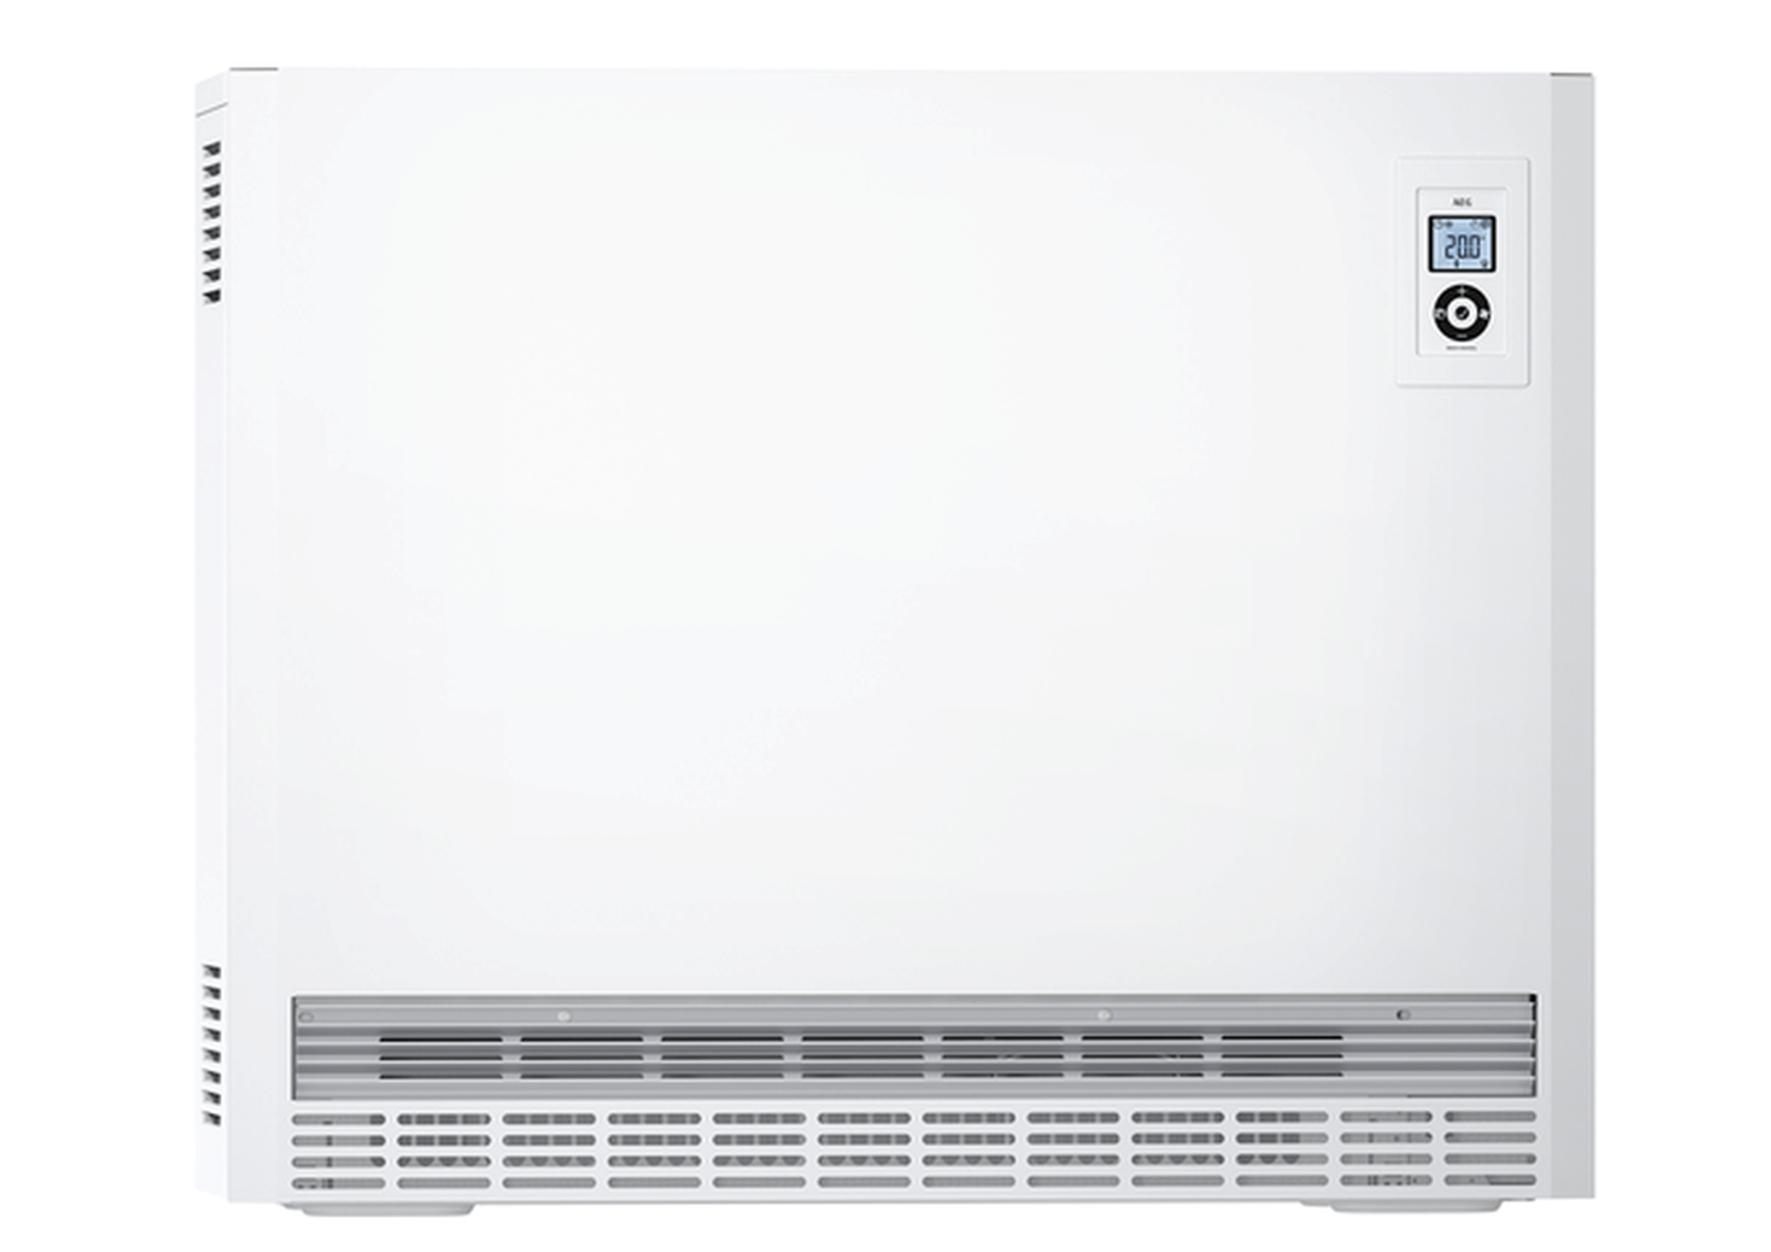 AEG Wärmespeicher - Standard-Baureihe